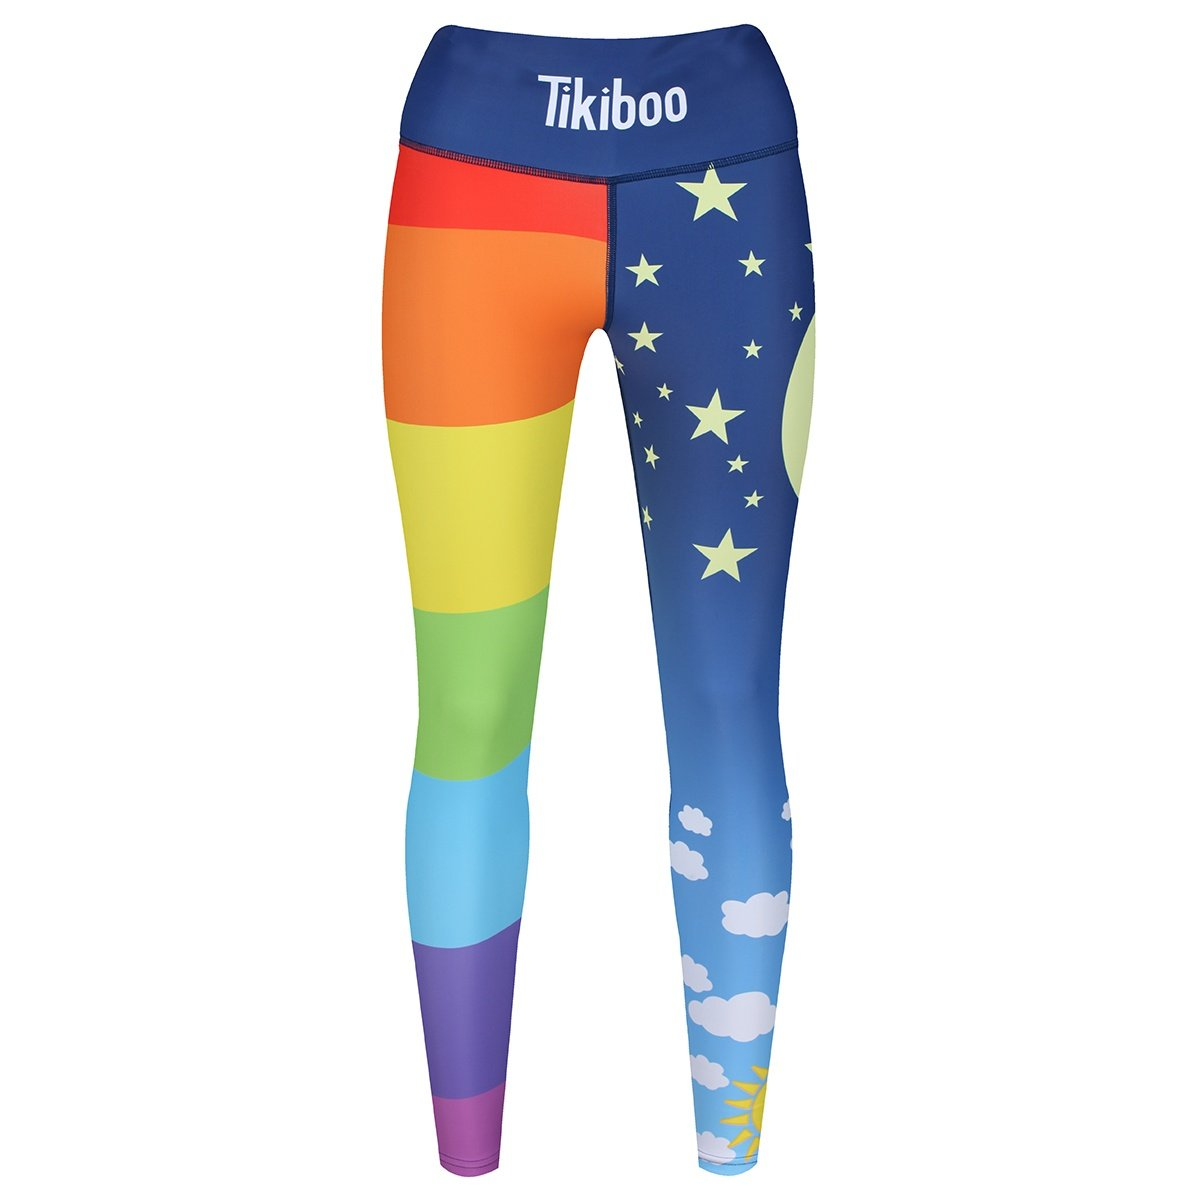 Rainbow Dreams Leggings 'Limited Edition' (Pre-order)